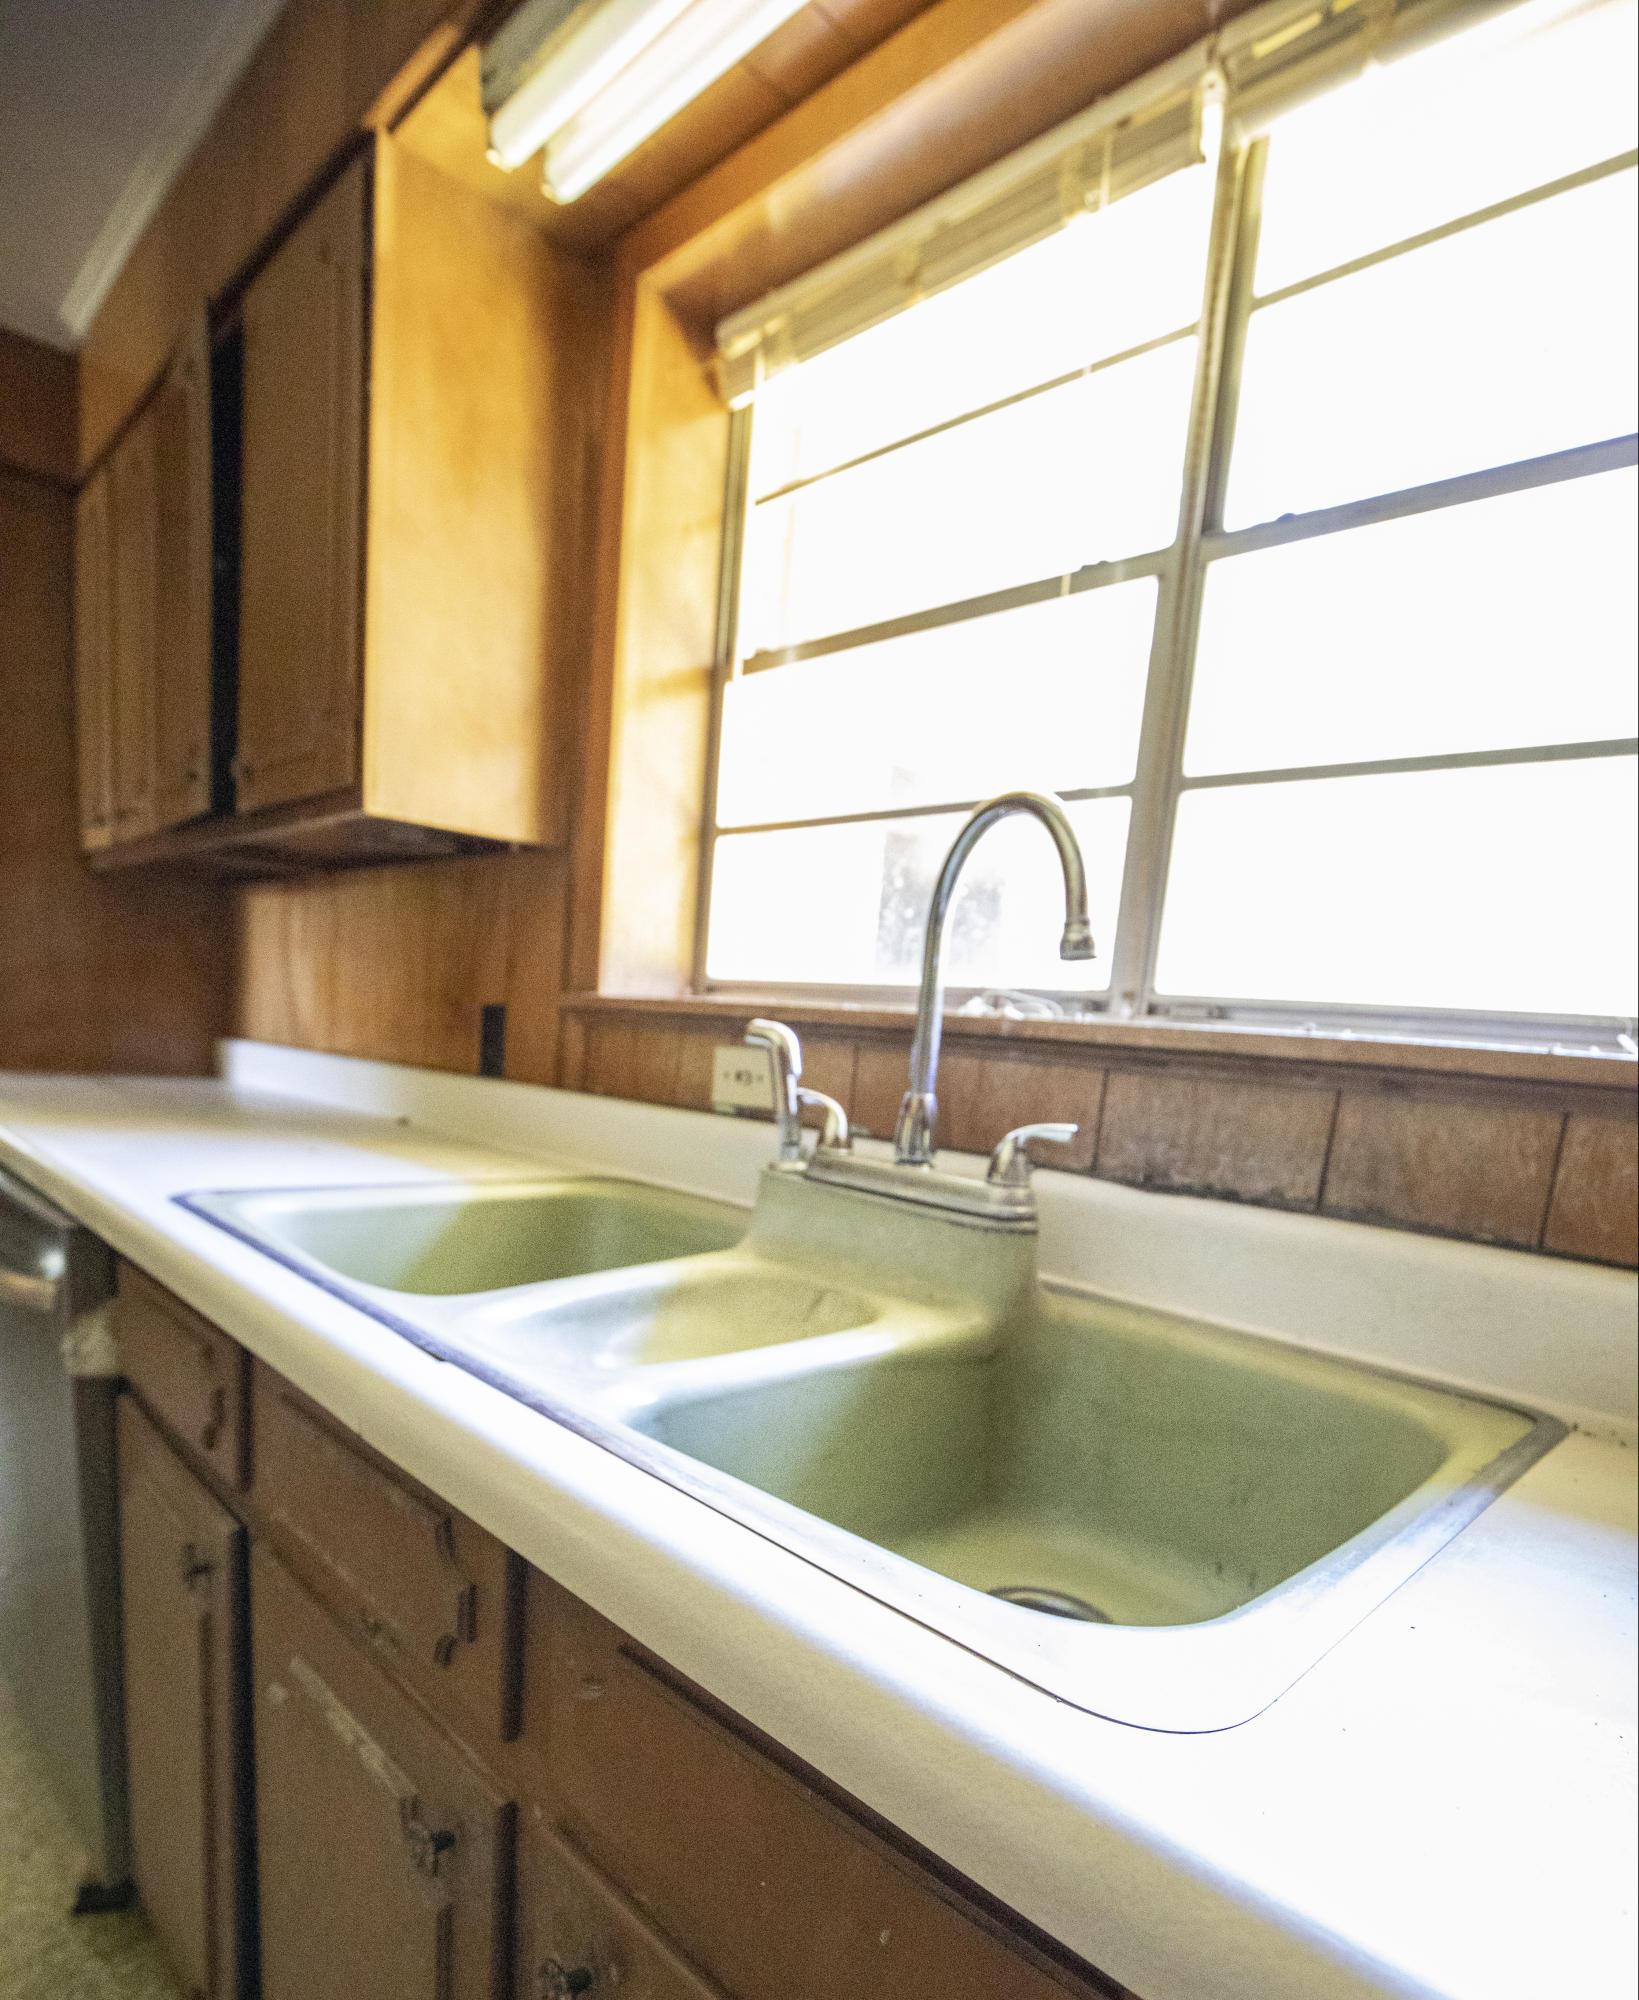 Leesville home for sale, 611 S 1st St, Leesville LA - $125,000